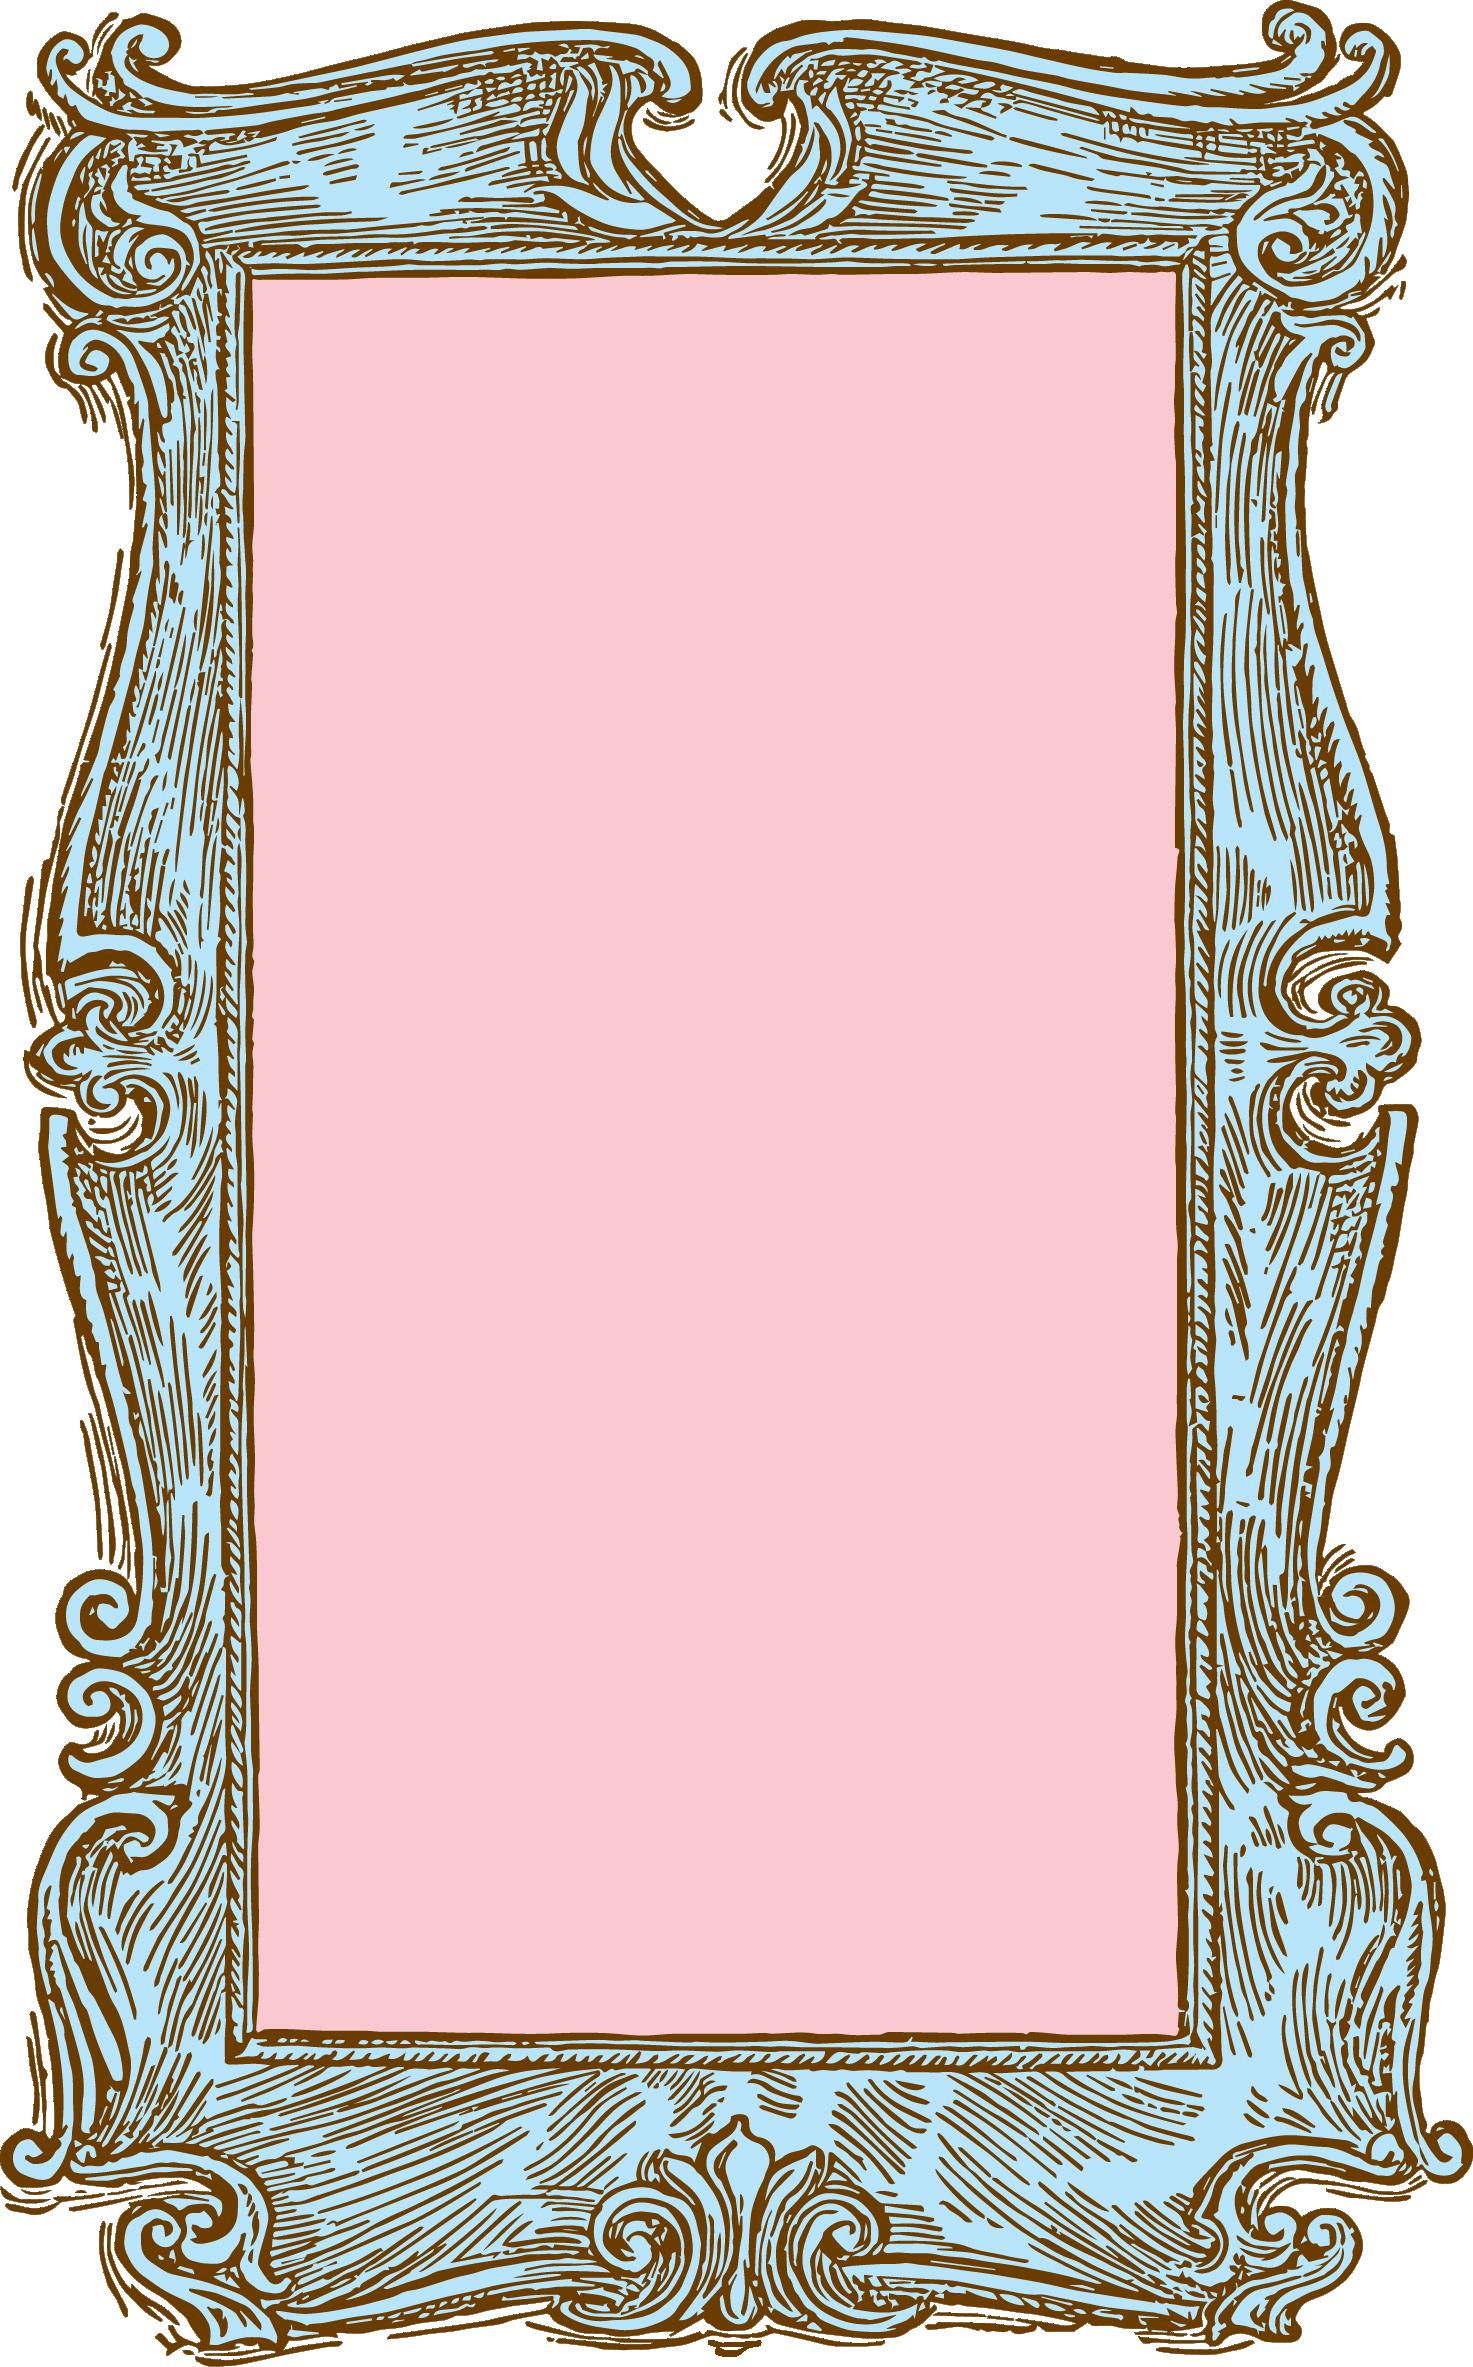 pink vintage frame clipart   clipart suggest